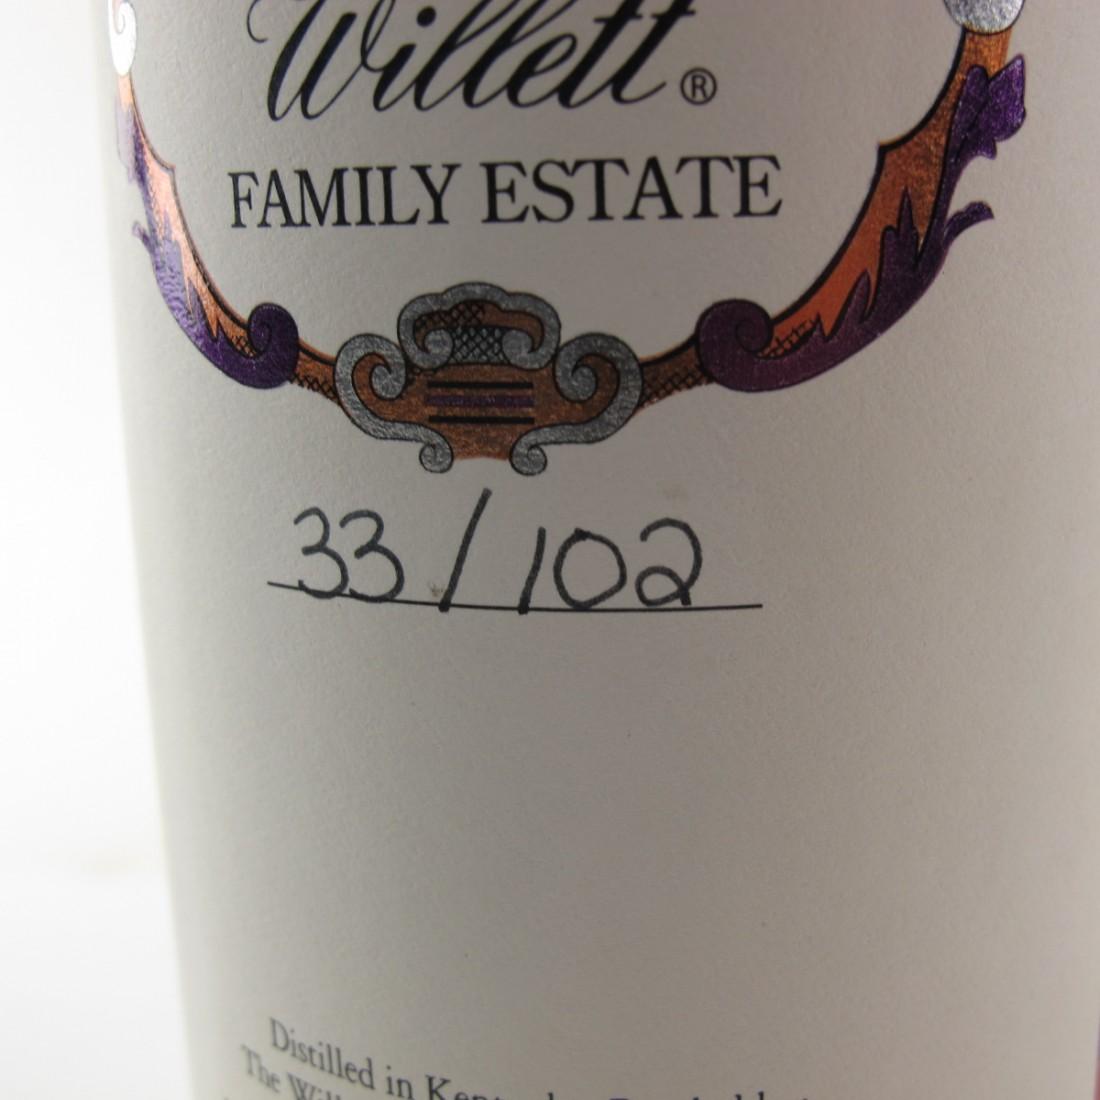 Willett Family Estate 14 Year Old Single Barrel Bourbon #8303